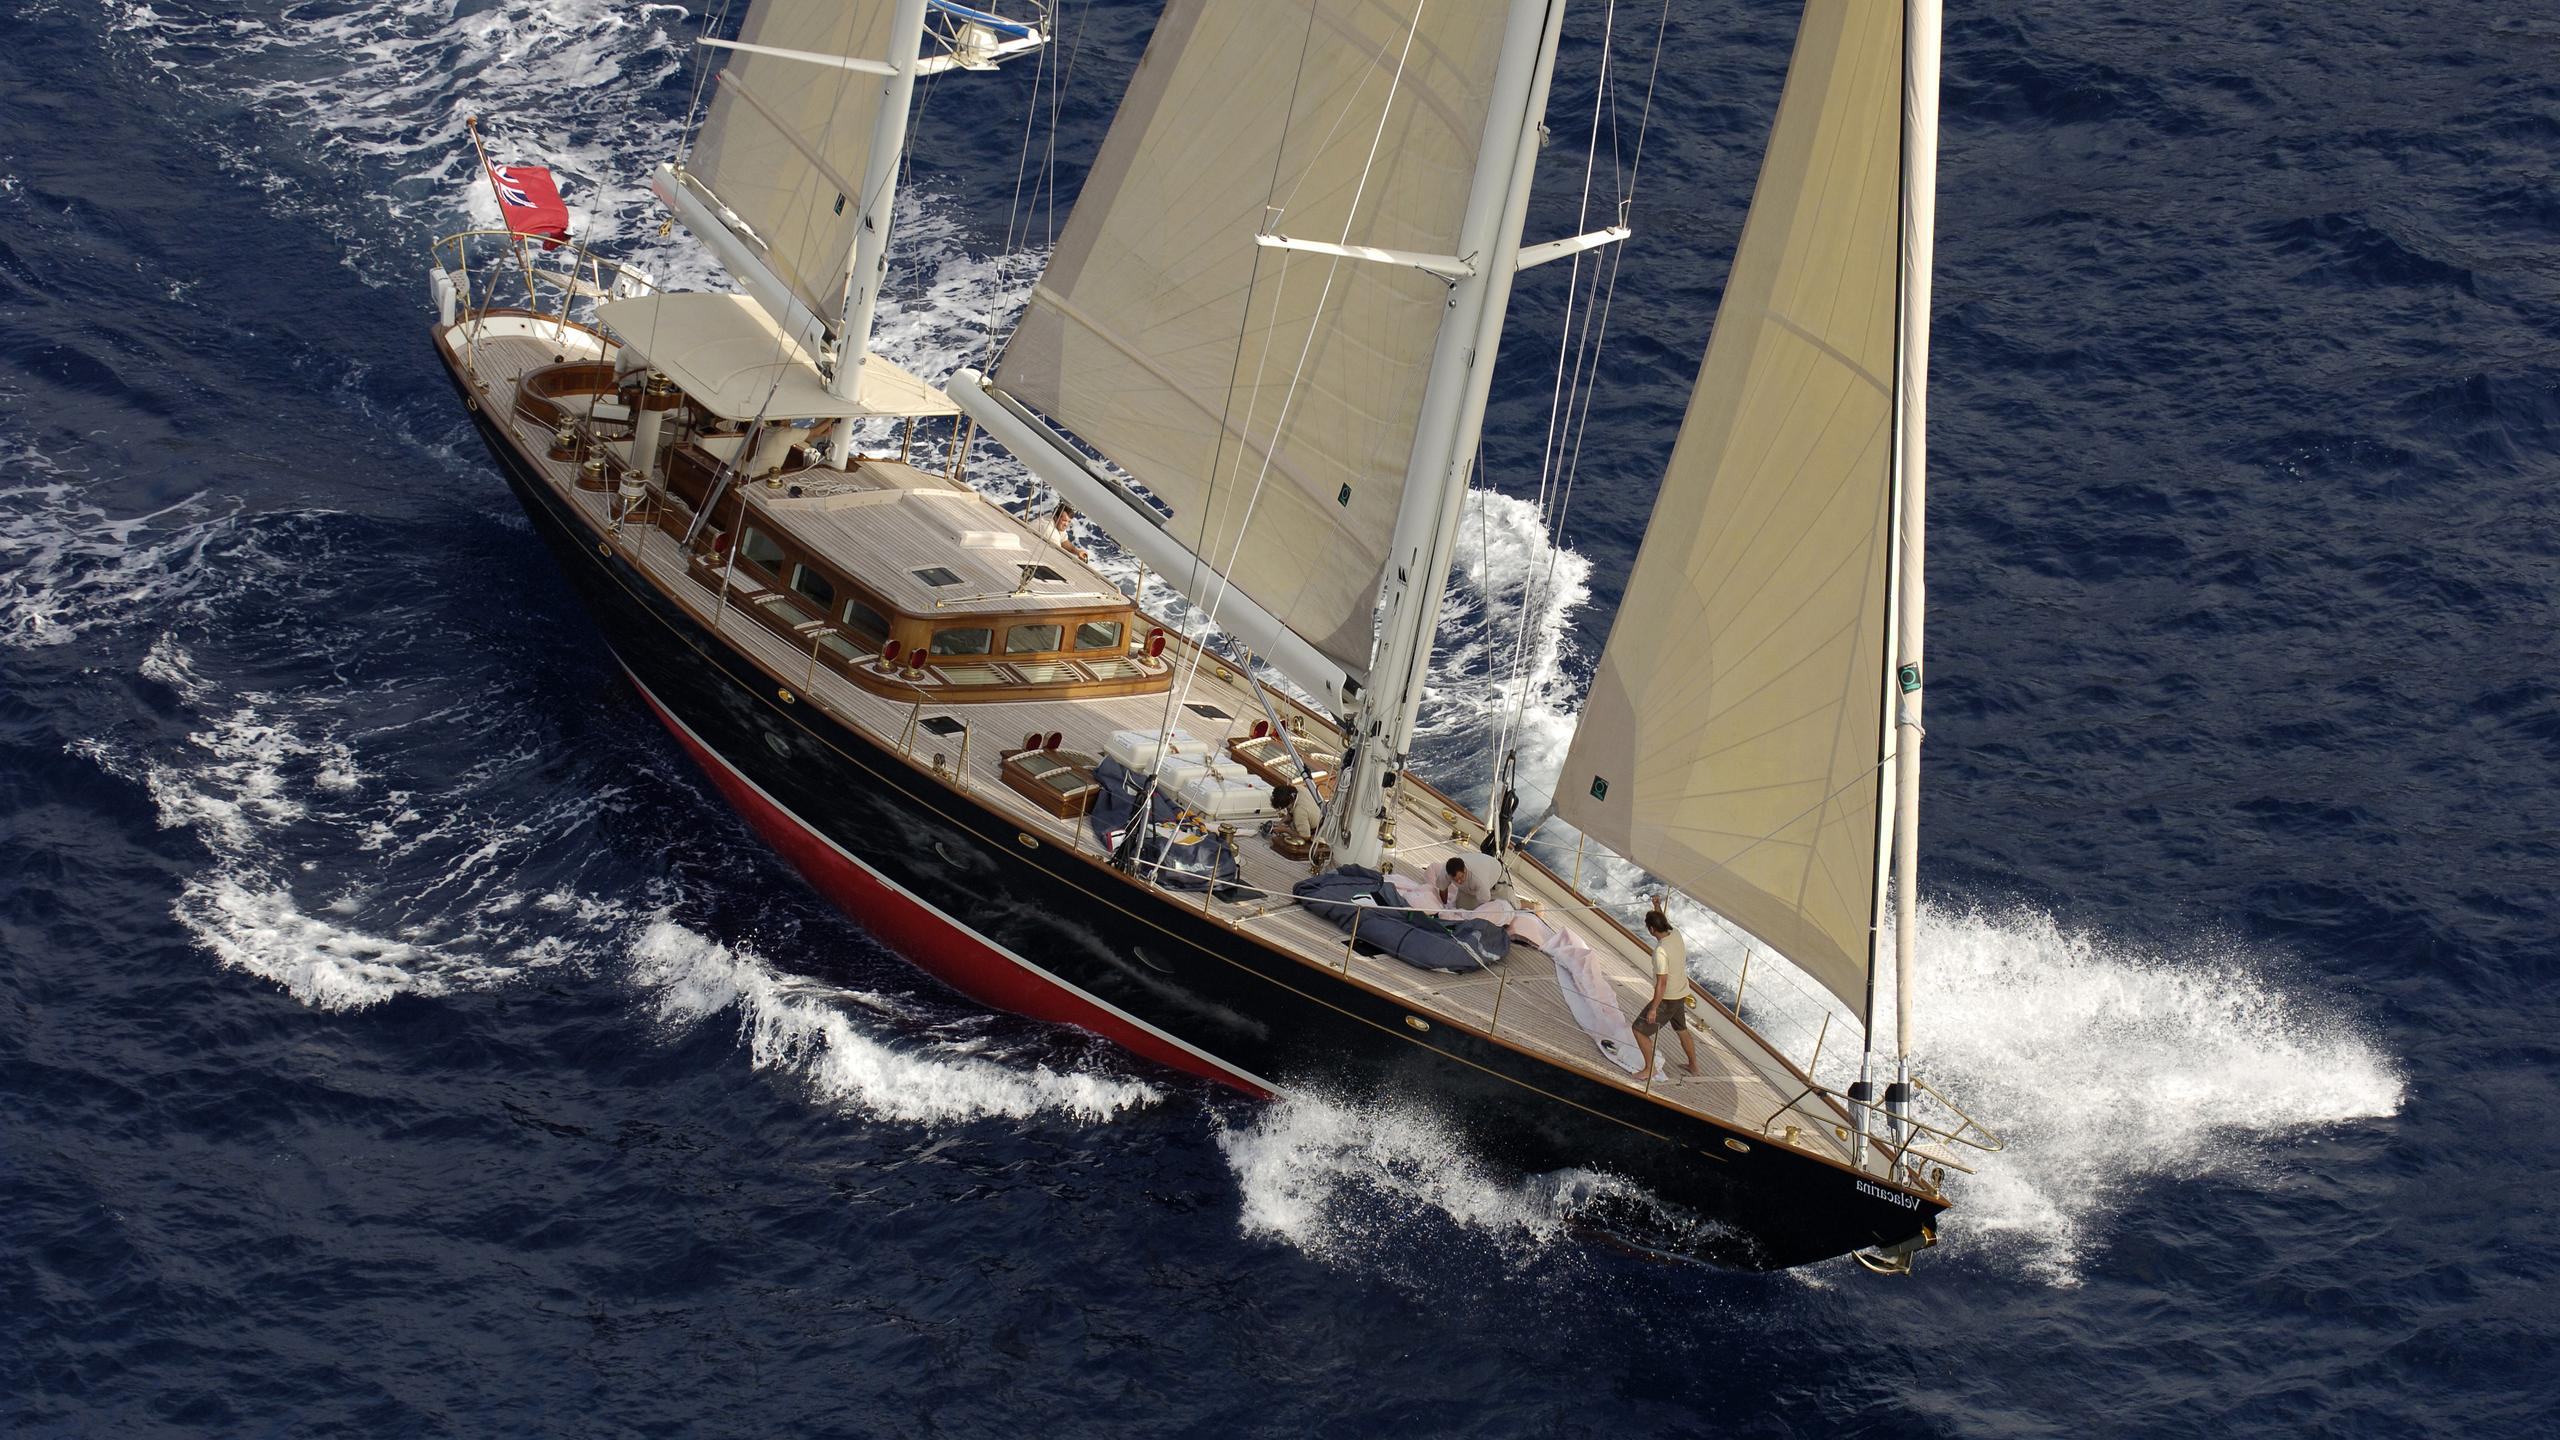 velacarina-yacht-at-sea